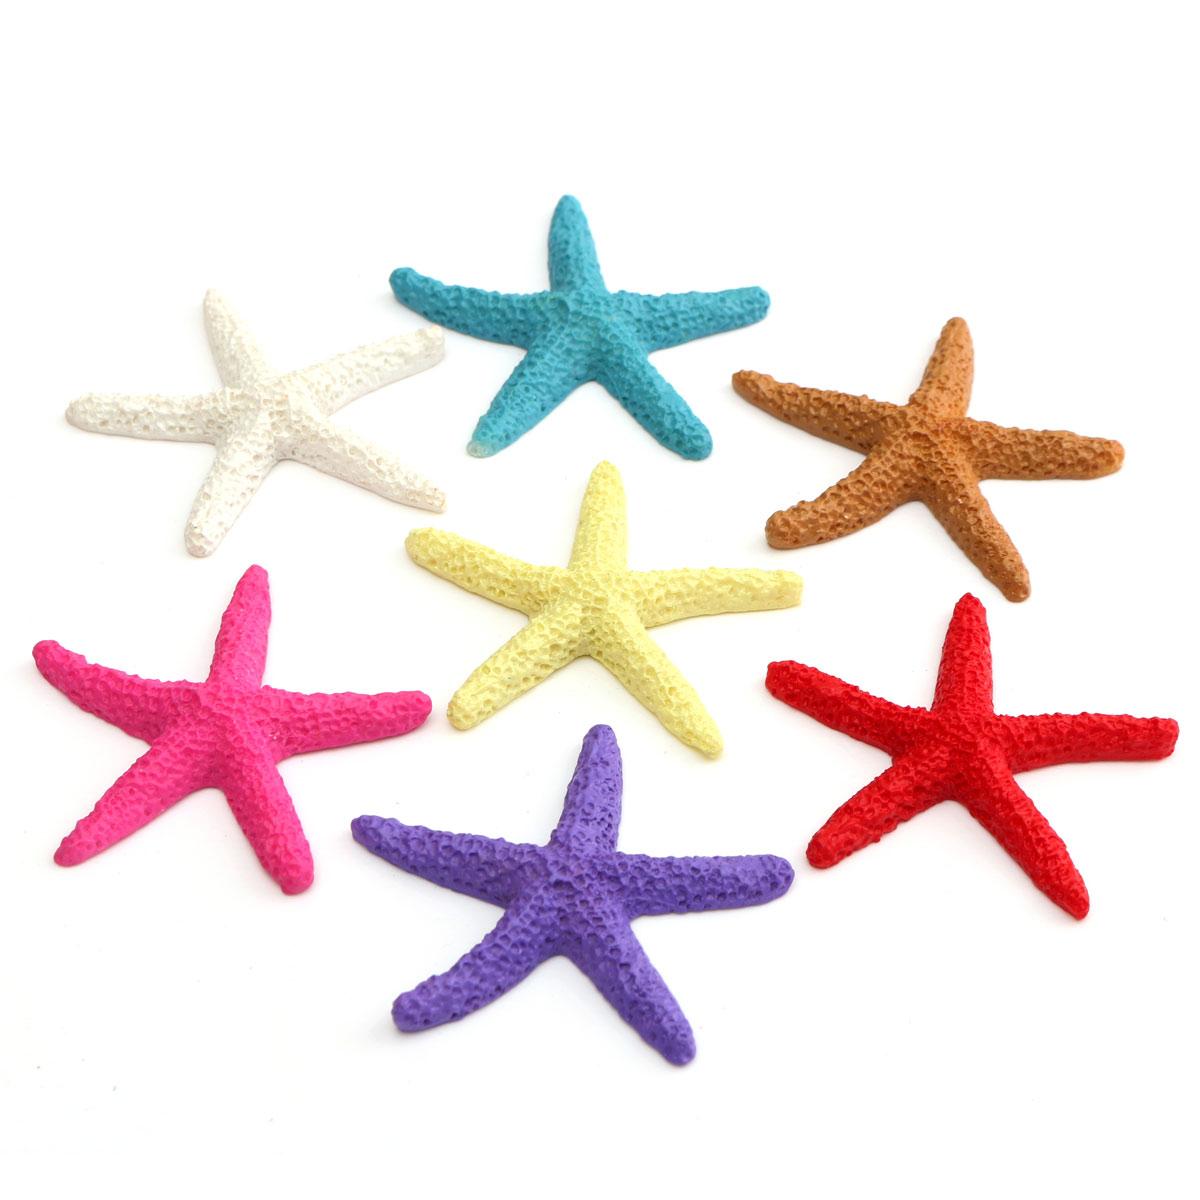 7pcs 5.5cm Mediterranean Style Colorful Mini Starfish Ornament Potted Craft Home Garden Decor 1pcs